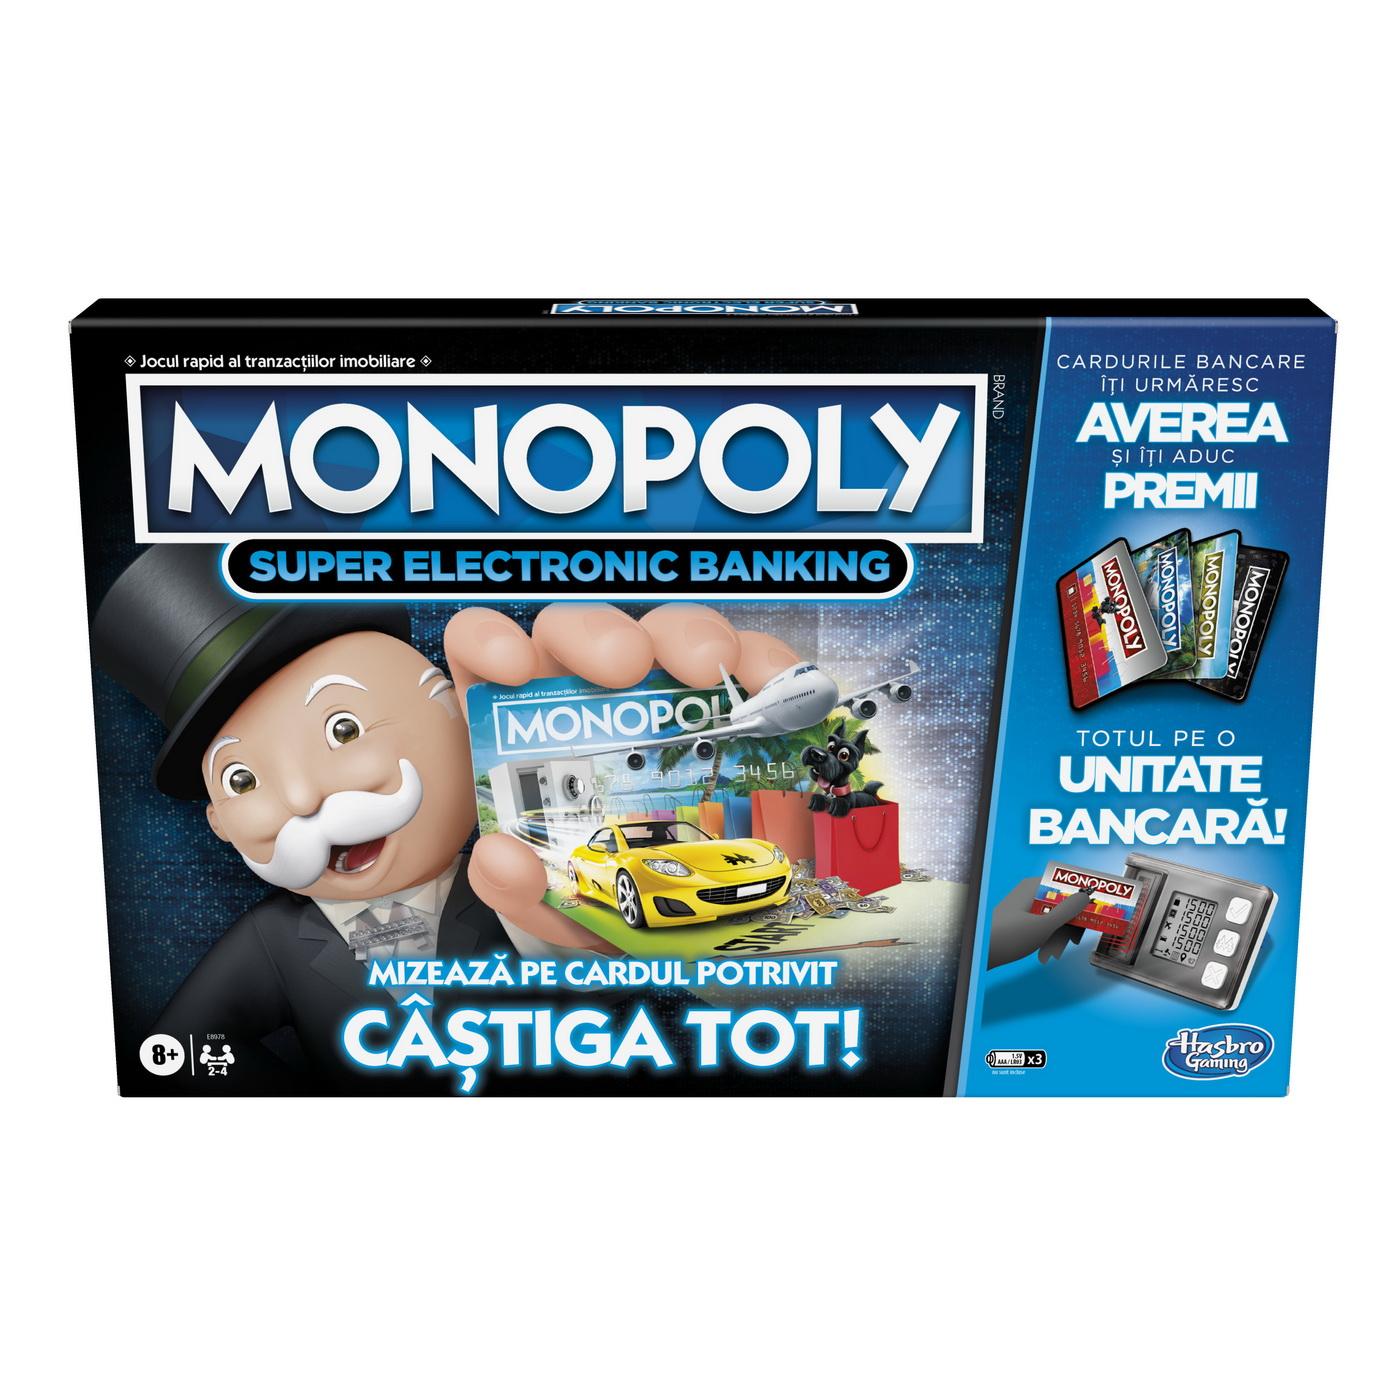 Monopoly Super Electronic Banking – Castiga Tot